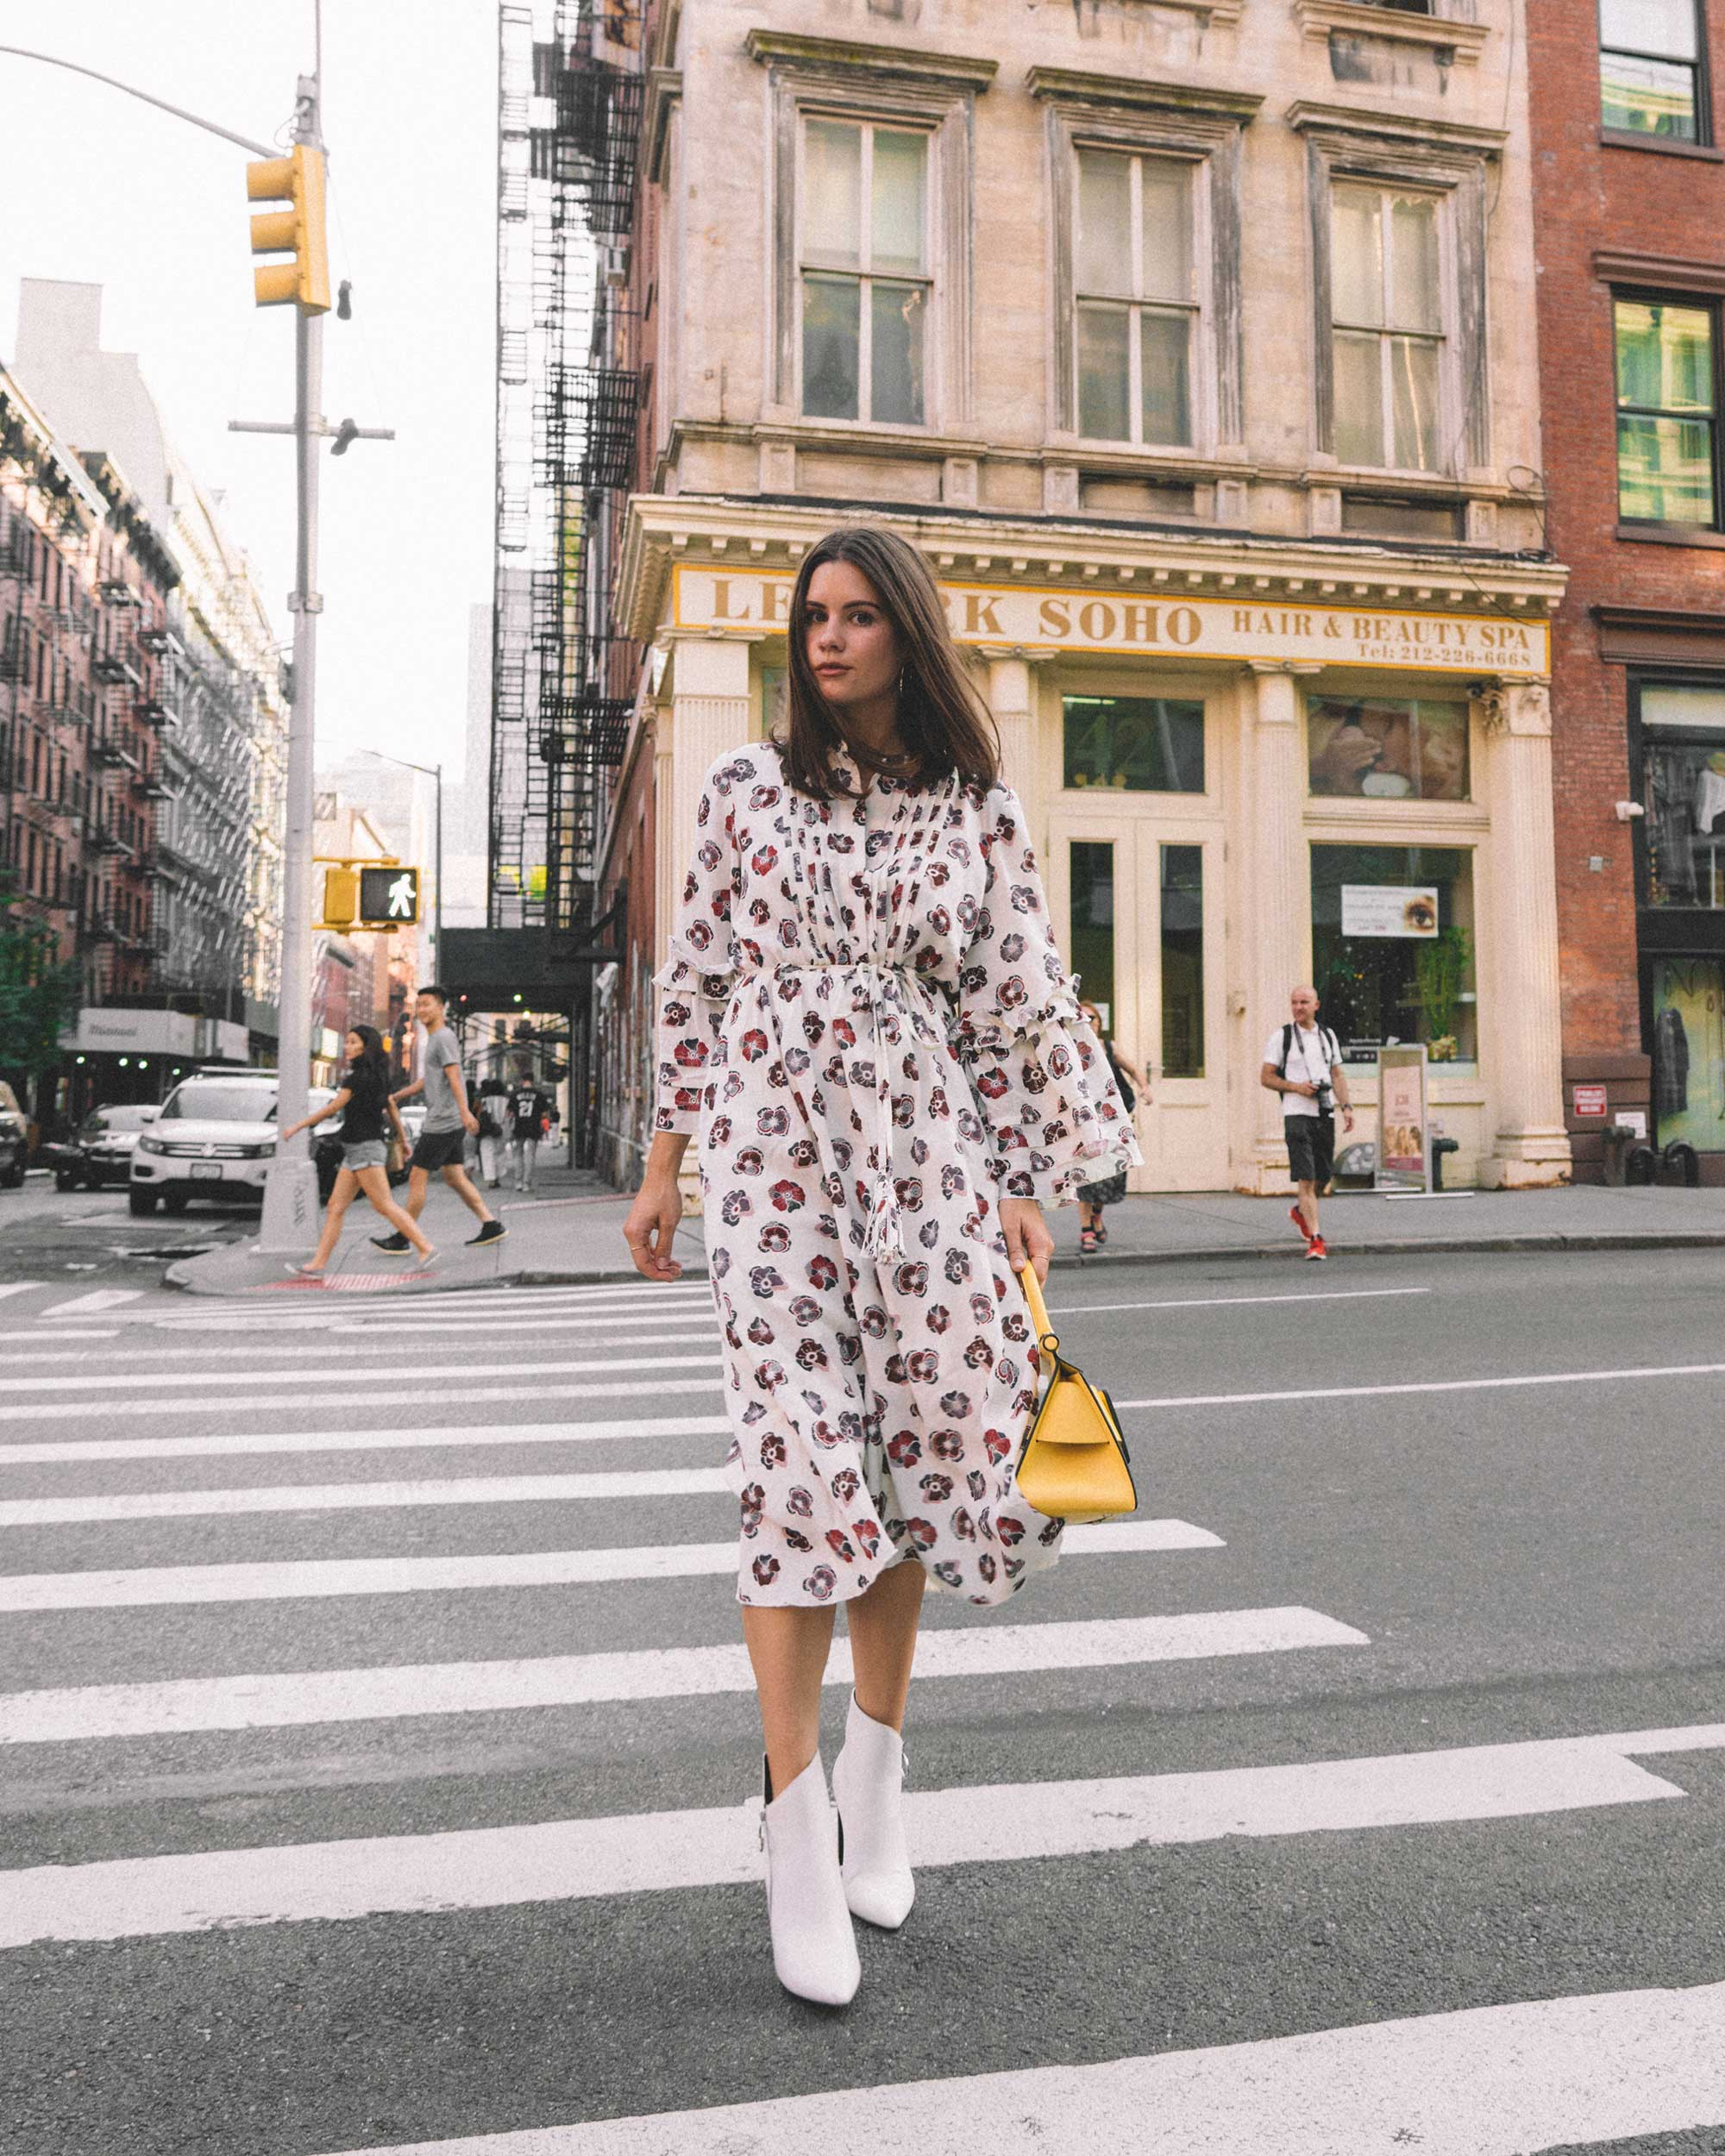 Madewell x Karen Walker Floral Fantasia Ruffled Dress and BOYY Karl 24 Bag soho new york fashion week outfit1.jpg